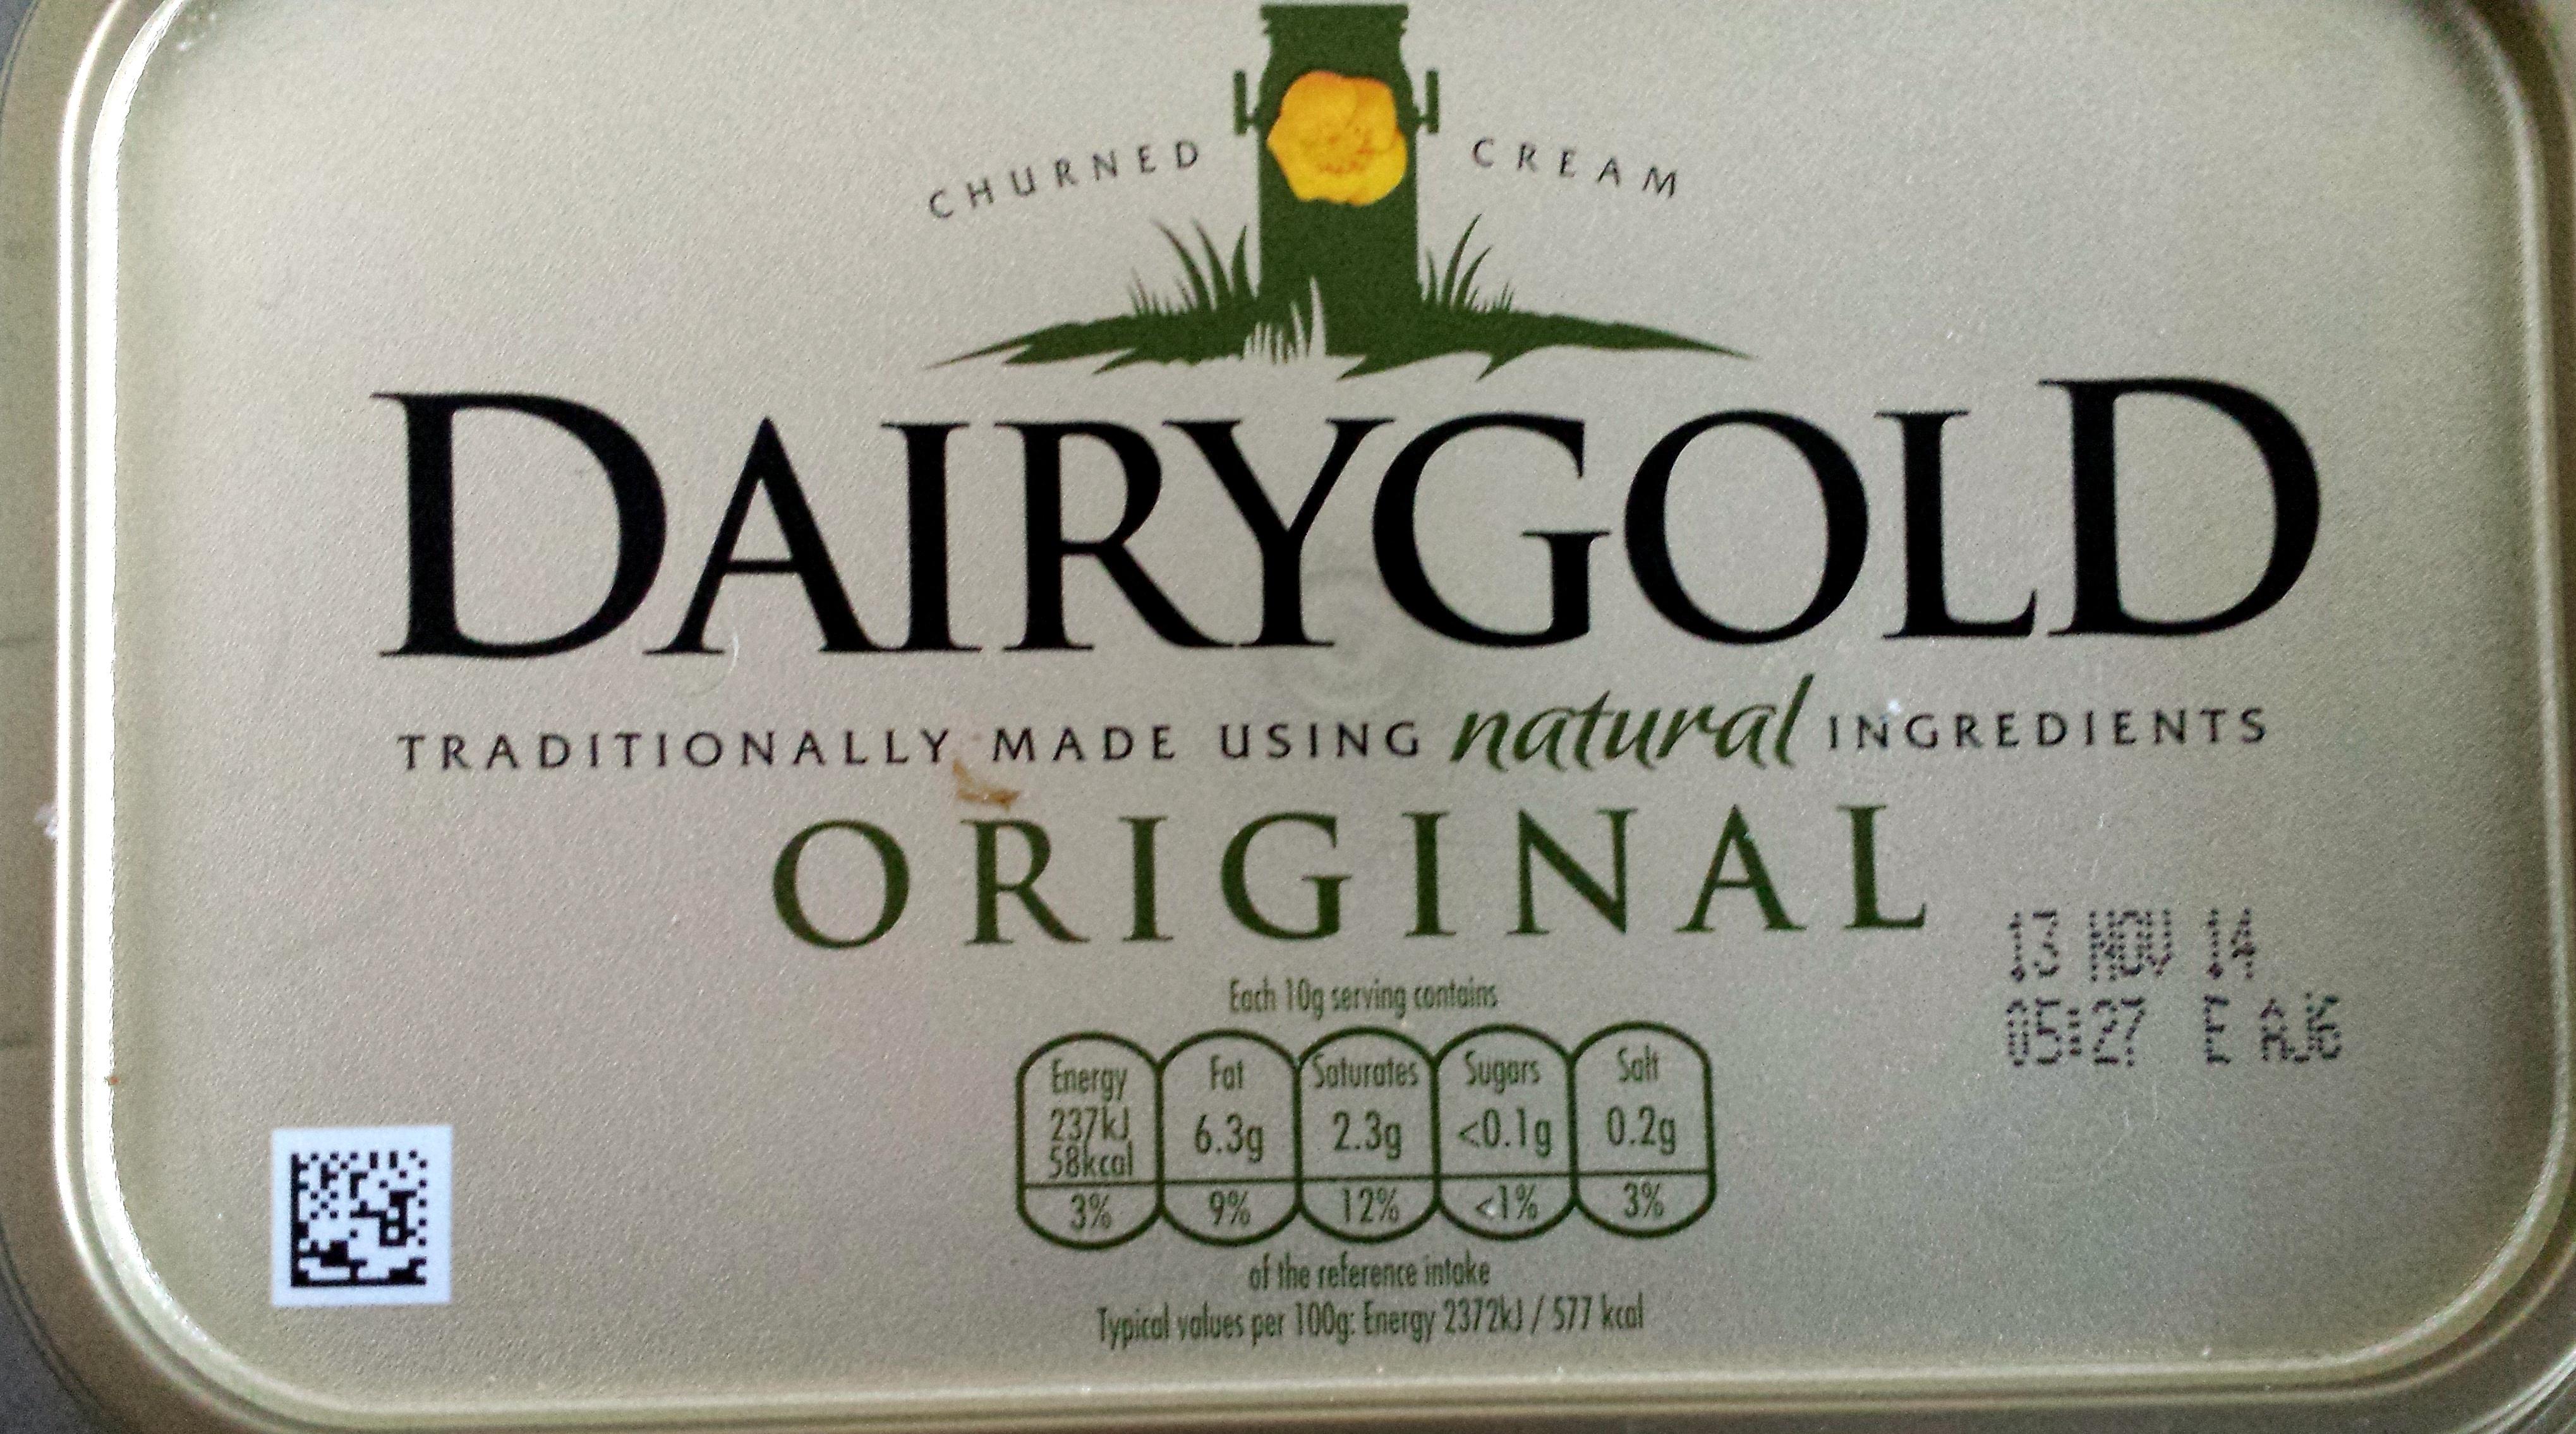 Dairygold Original Churned Cream - 454G - Product - en